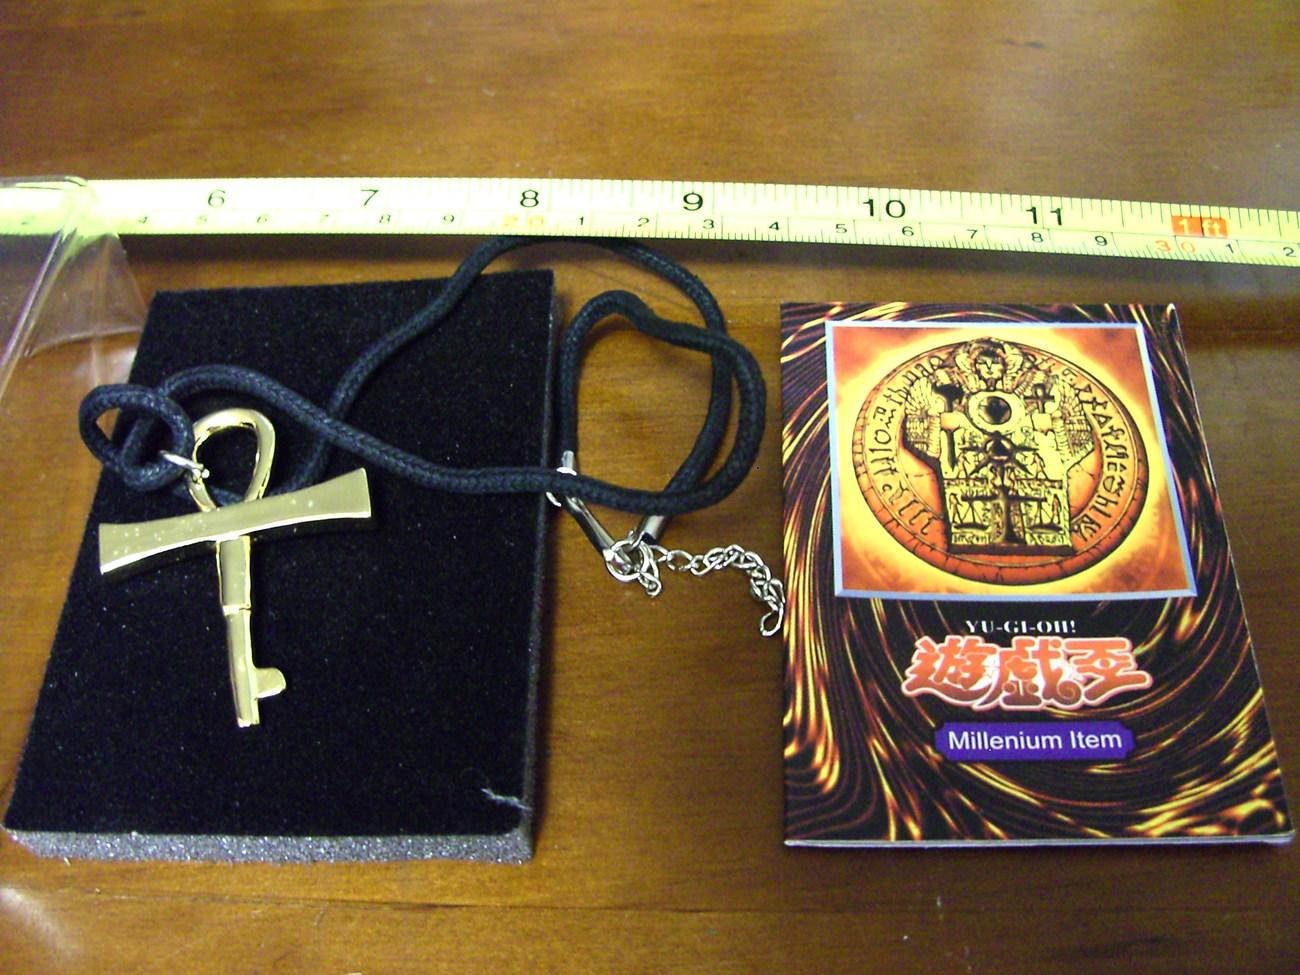 RARE Japanese Yu-Gi-Oh! Cosplay Gold Millennium Key Necklace! LAST ONE LEFT!